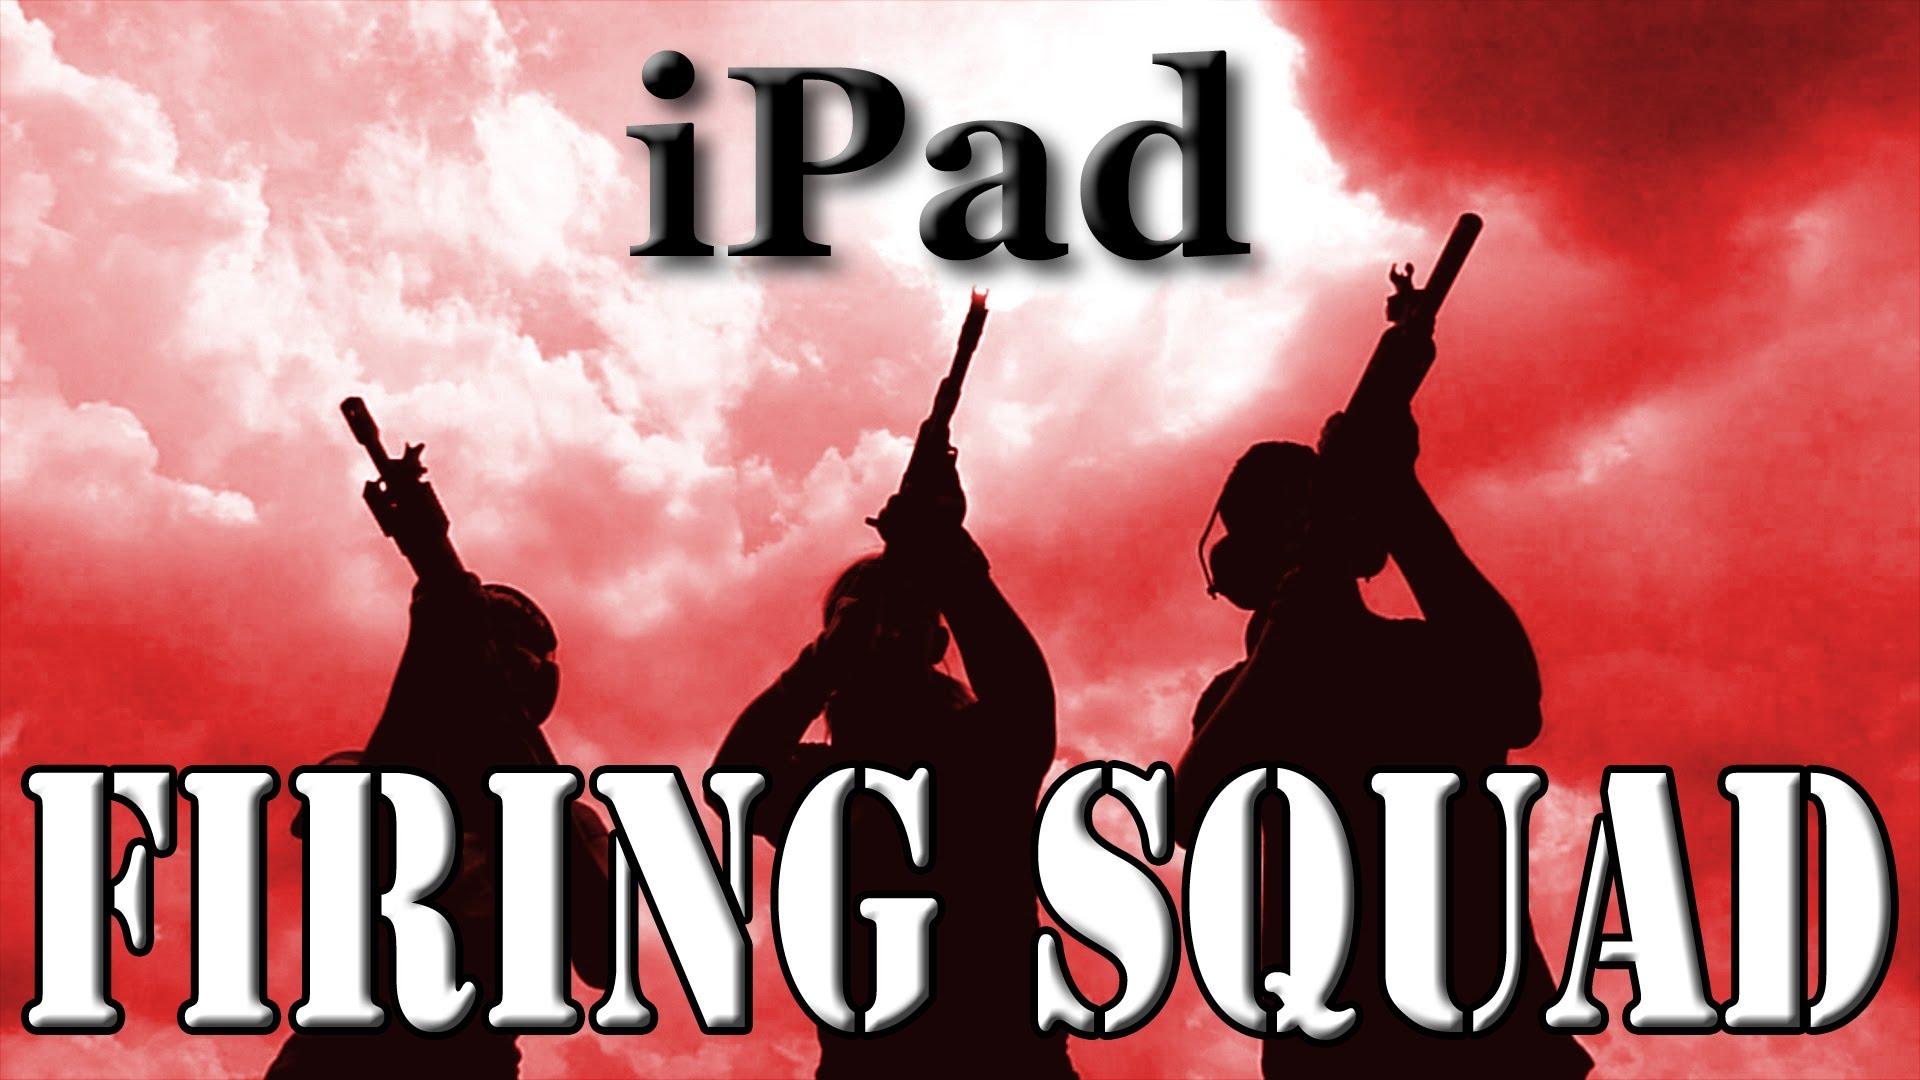 Firing Squad vs iPad